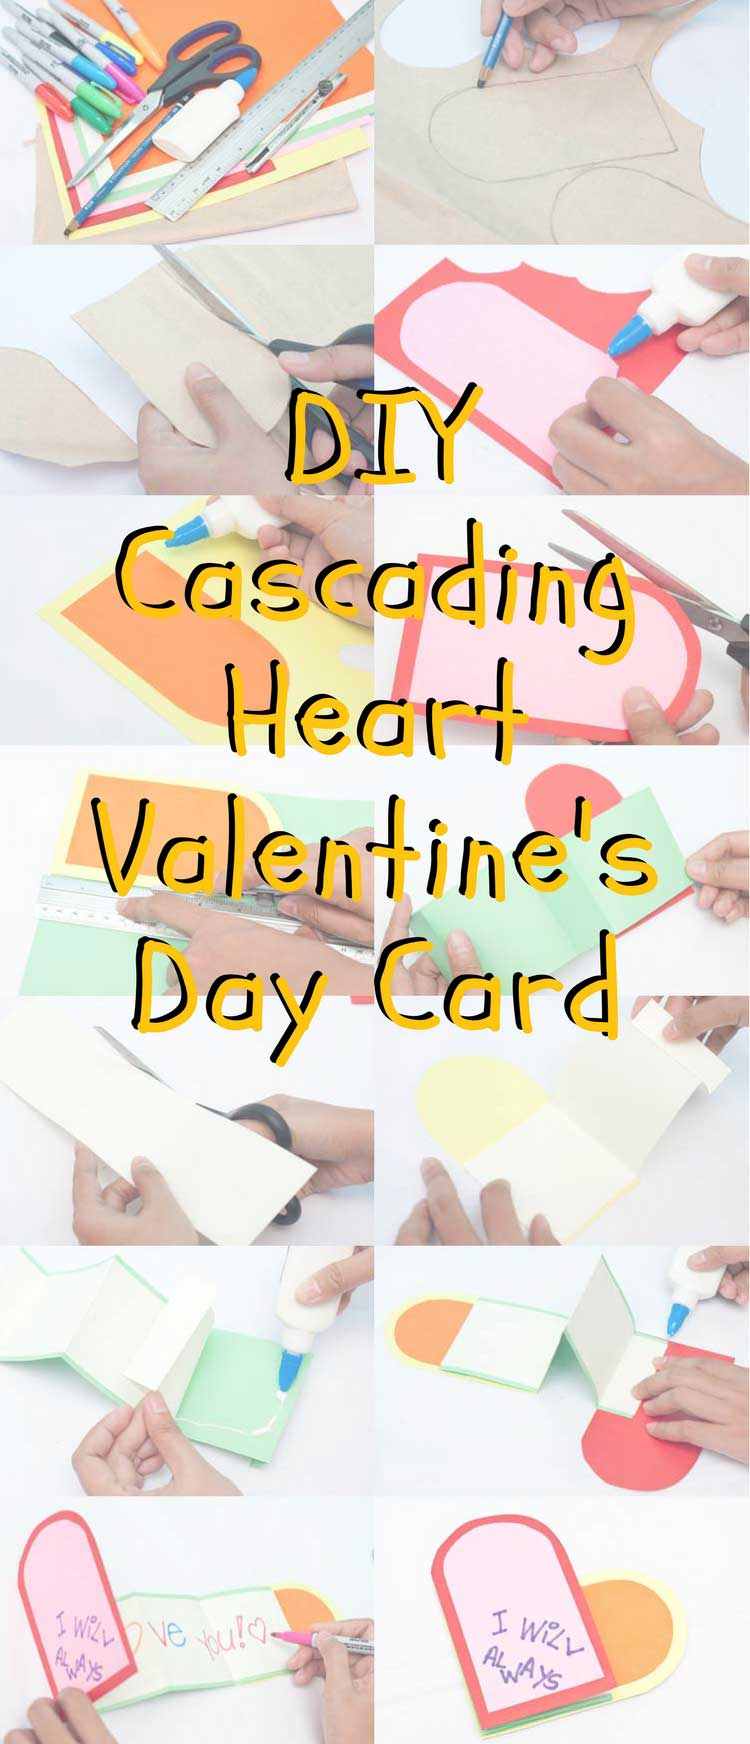 DIY Cascading Heart Valentine's Day Card Craft